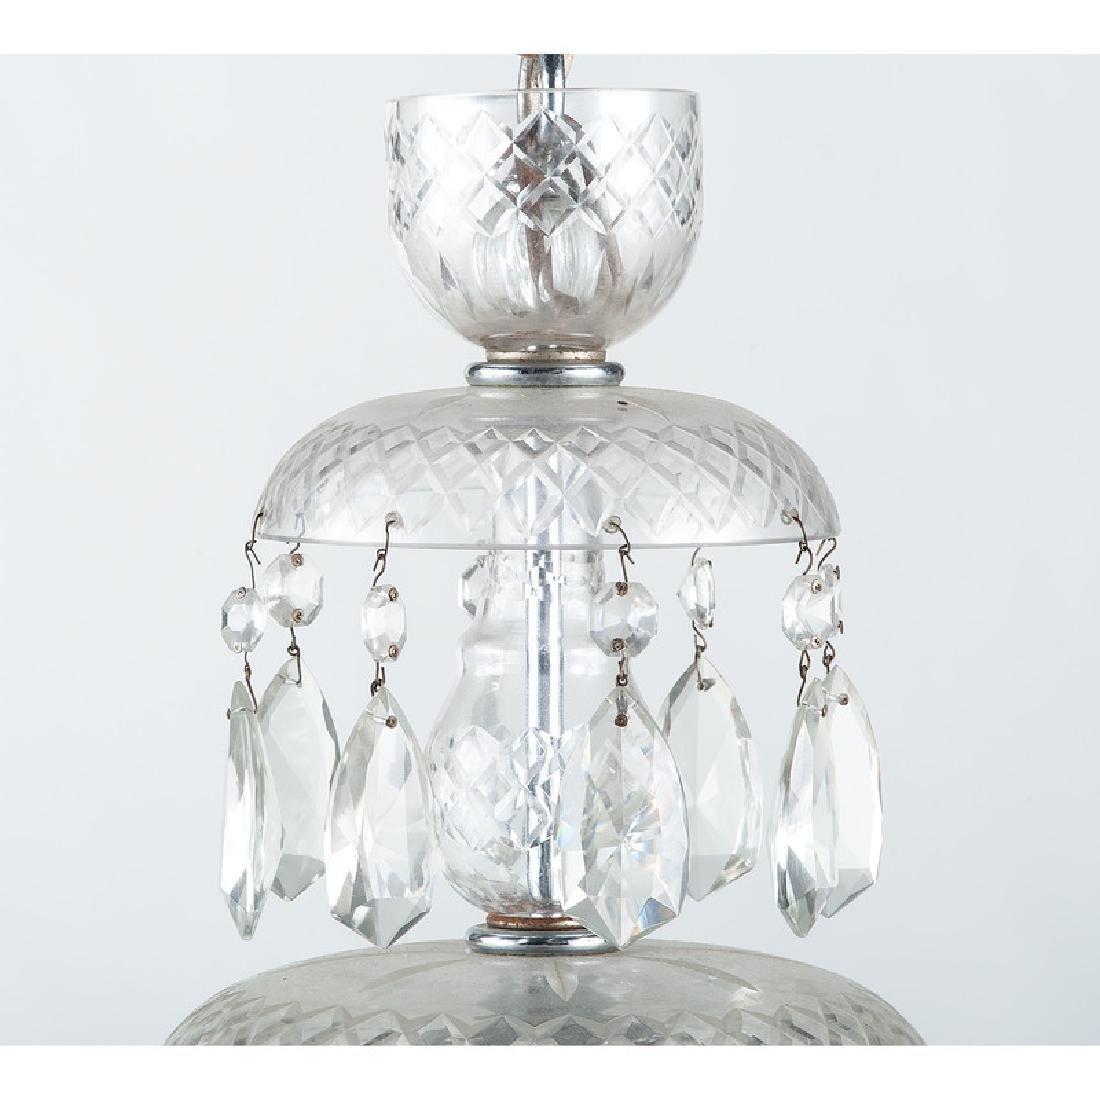 Pressed Glass Chandelier - 4